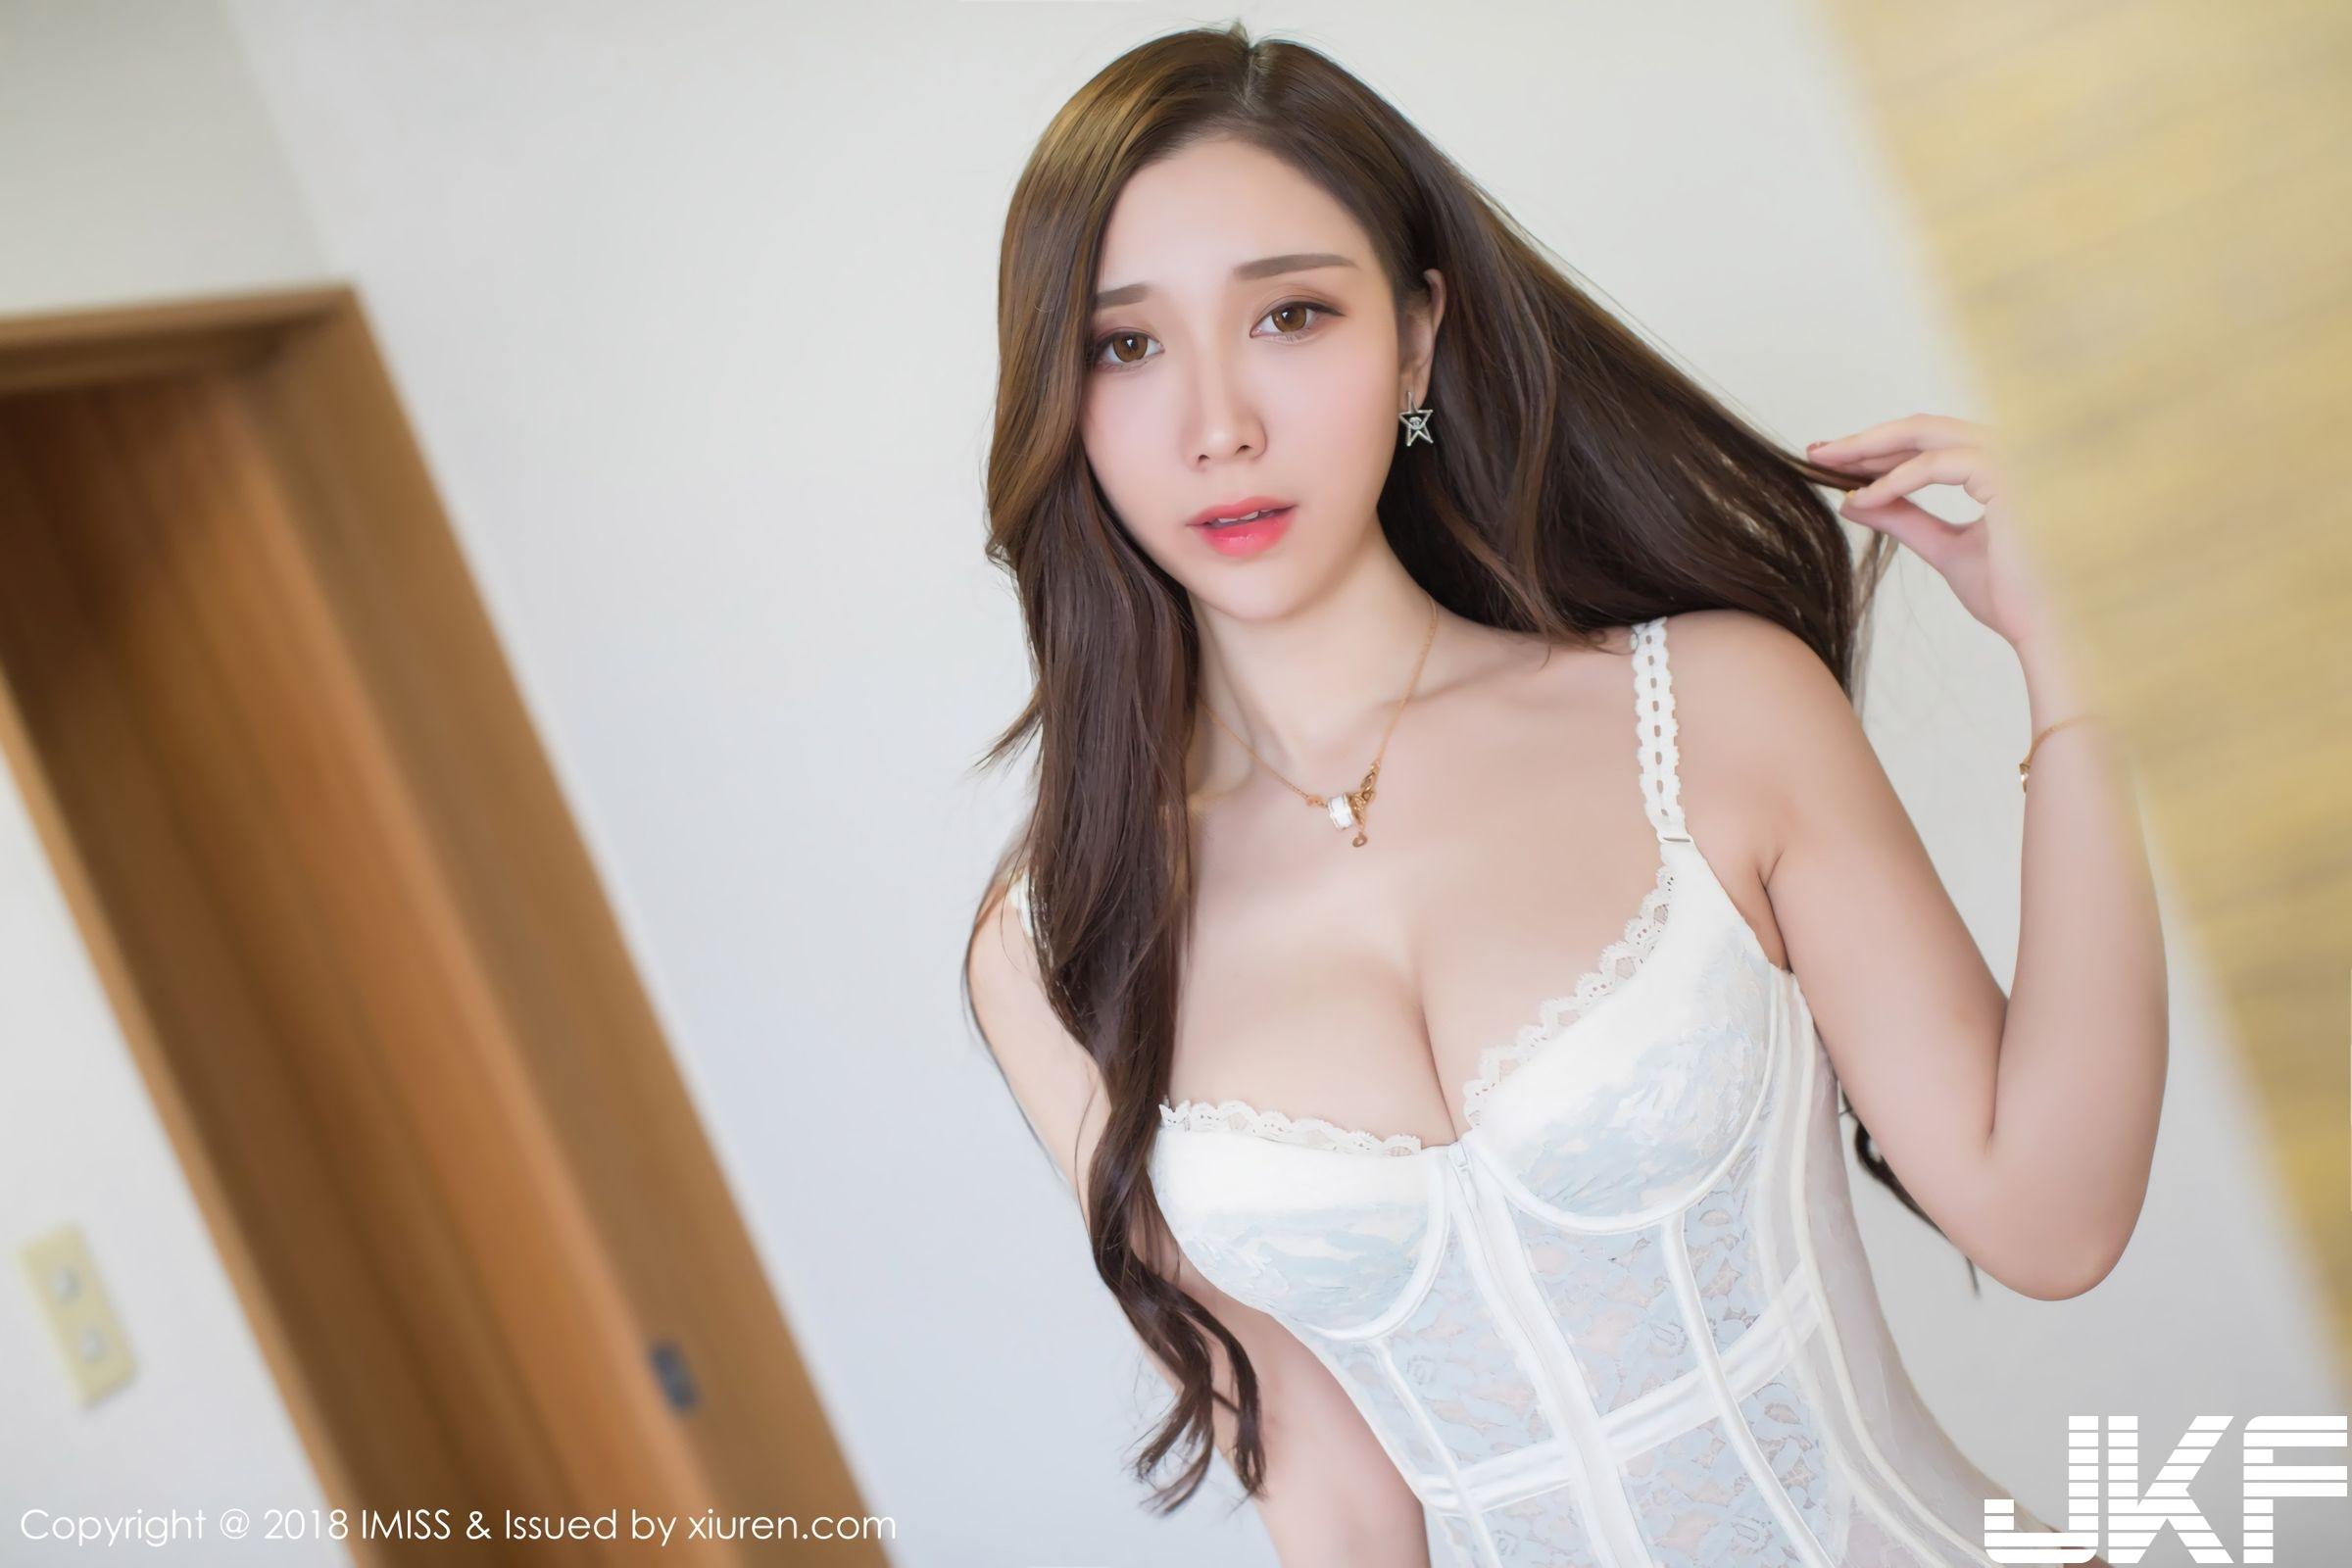 (34P)養眼美女淼淼萌萌哒 輕靈之氣神若秋水_愛蜜社 - 貼圖 - 清涼寫真 -